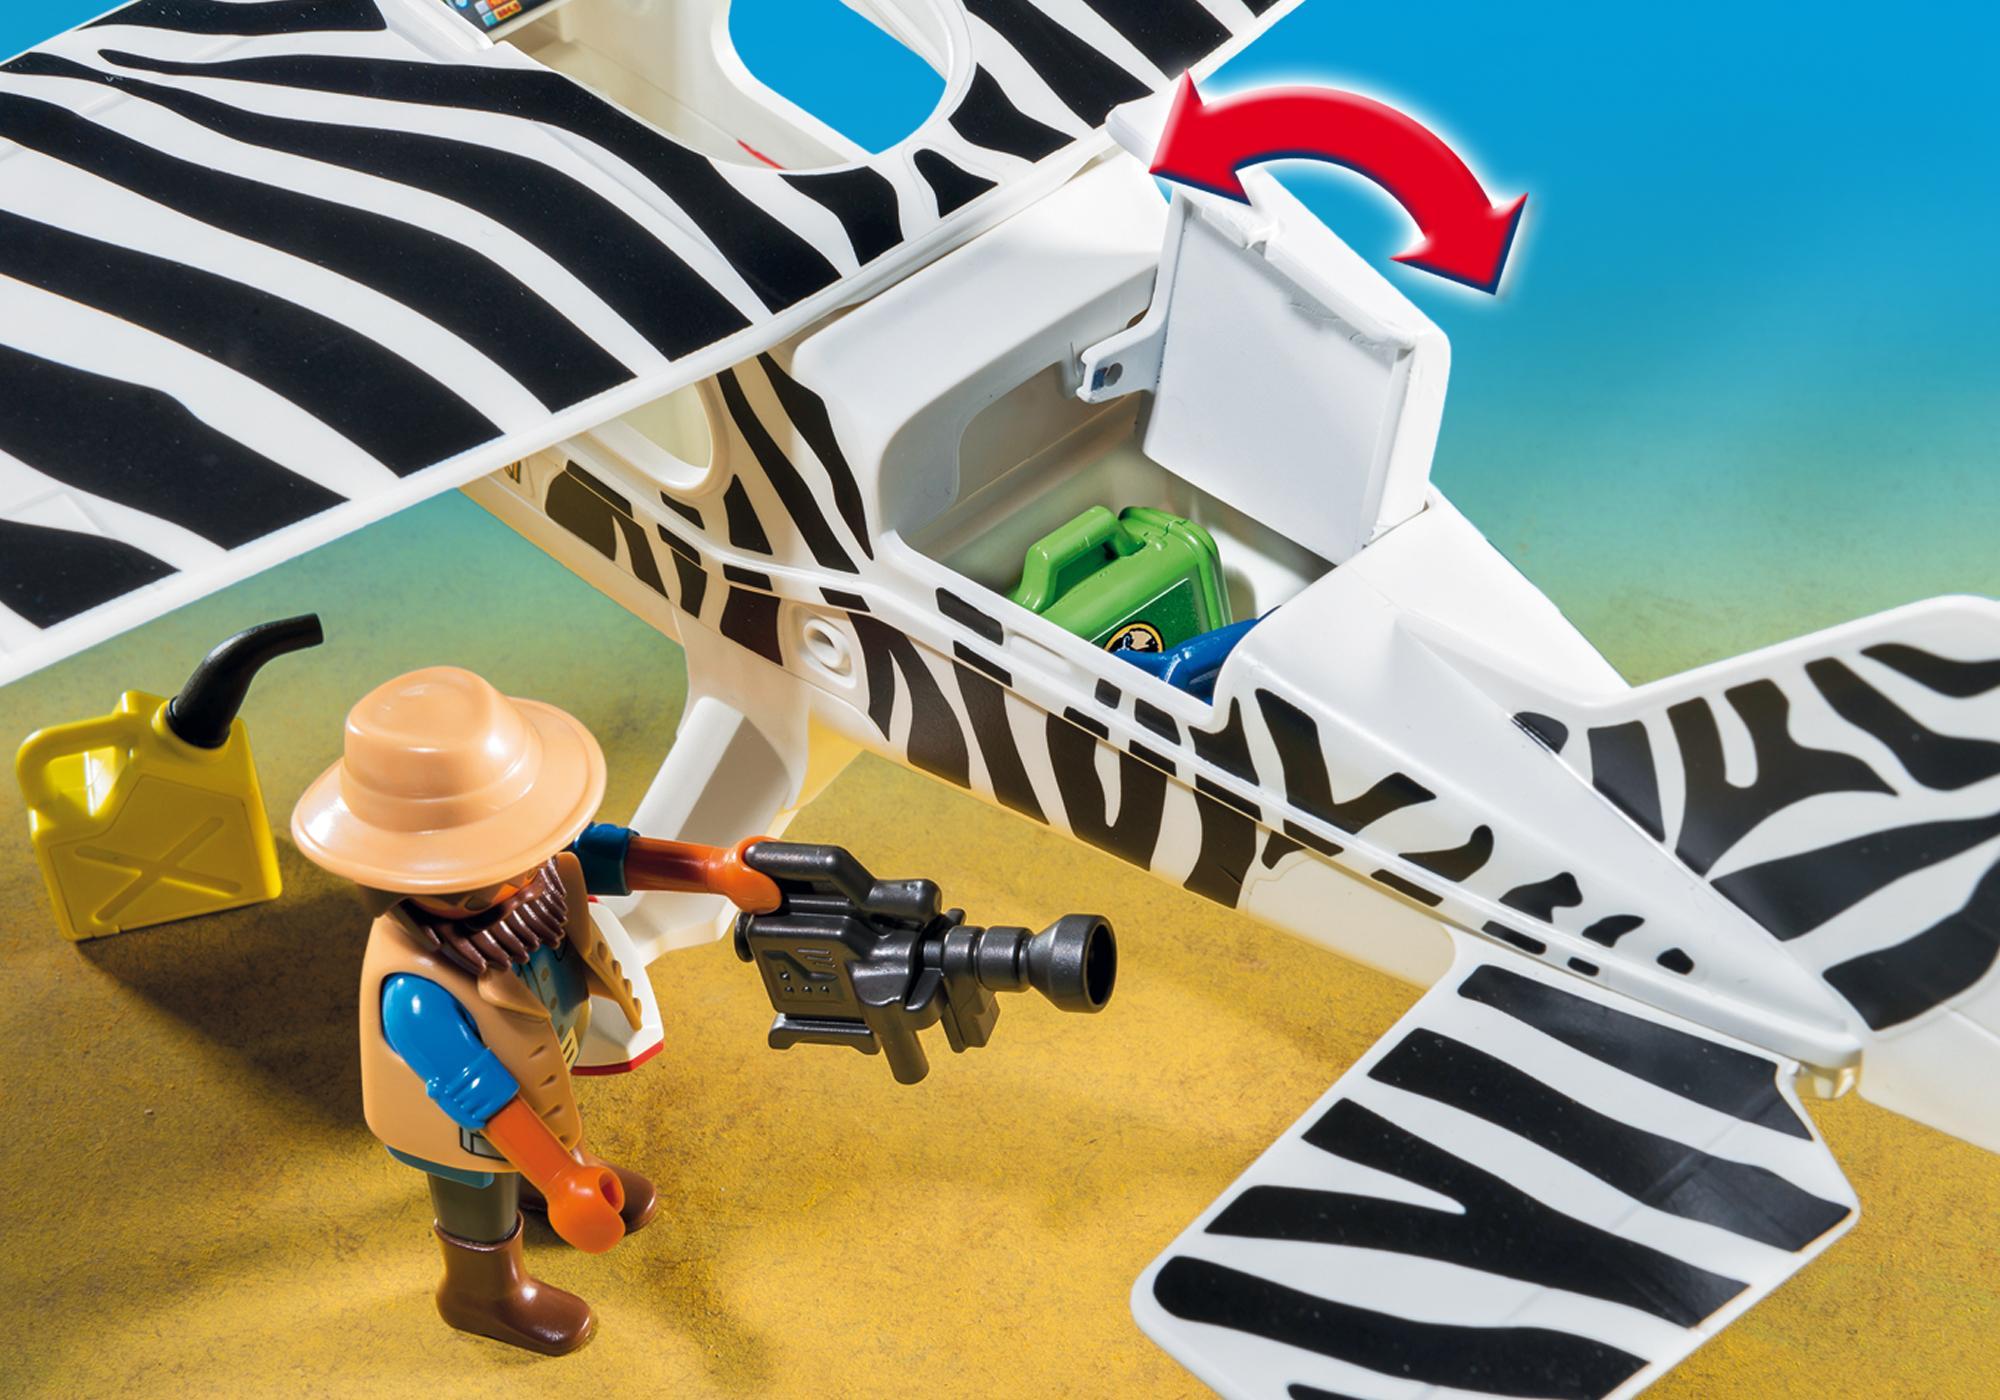 http://media.playmobil.com/i/playmobil/6938_product_extra1/Samolot safari